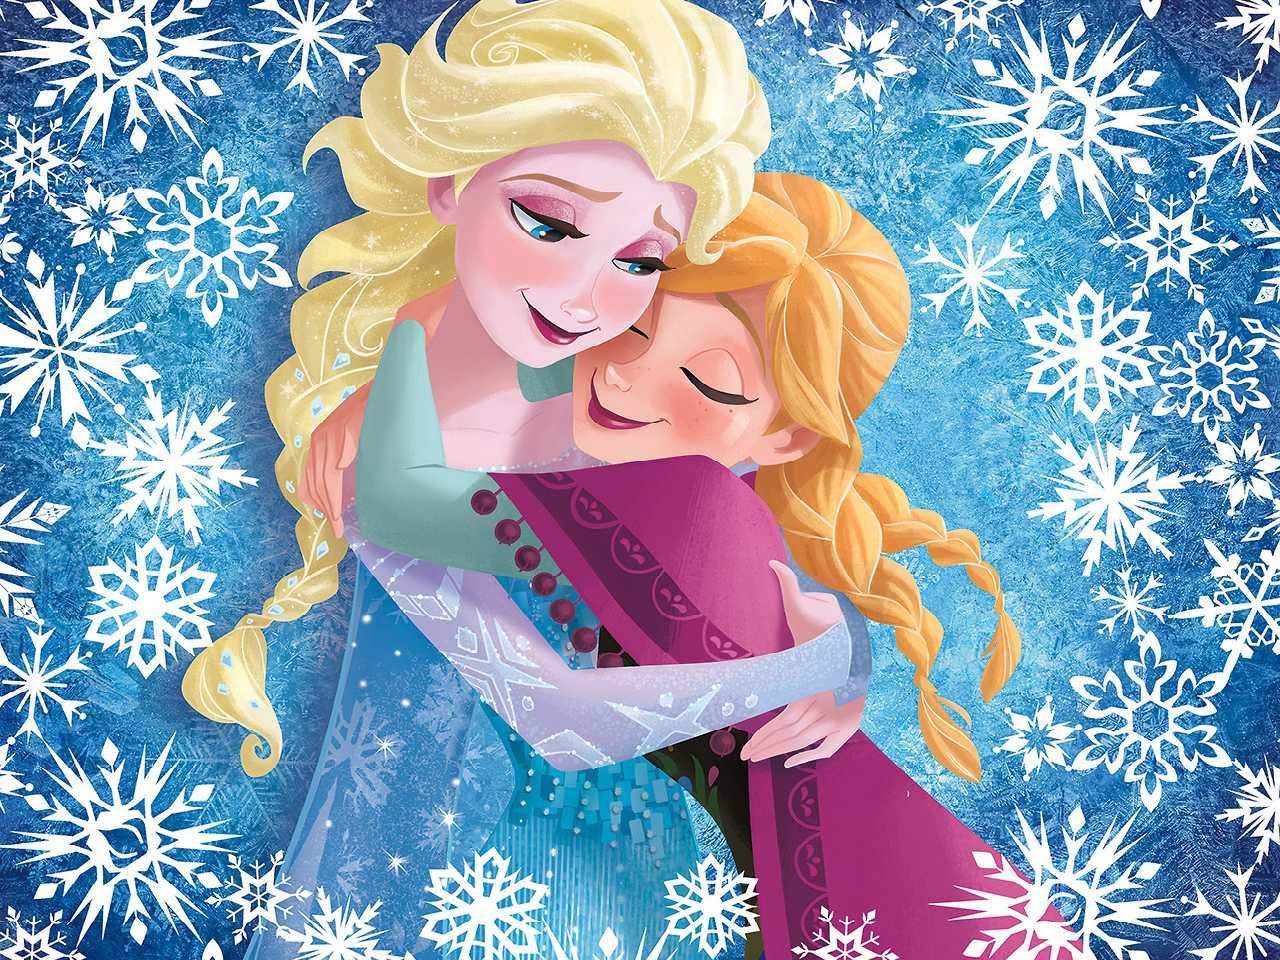 Frozen Images Frozen Wallpaper Hd Wallpaper And Background Photos